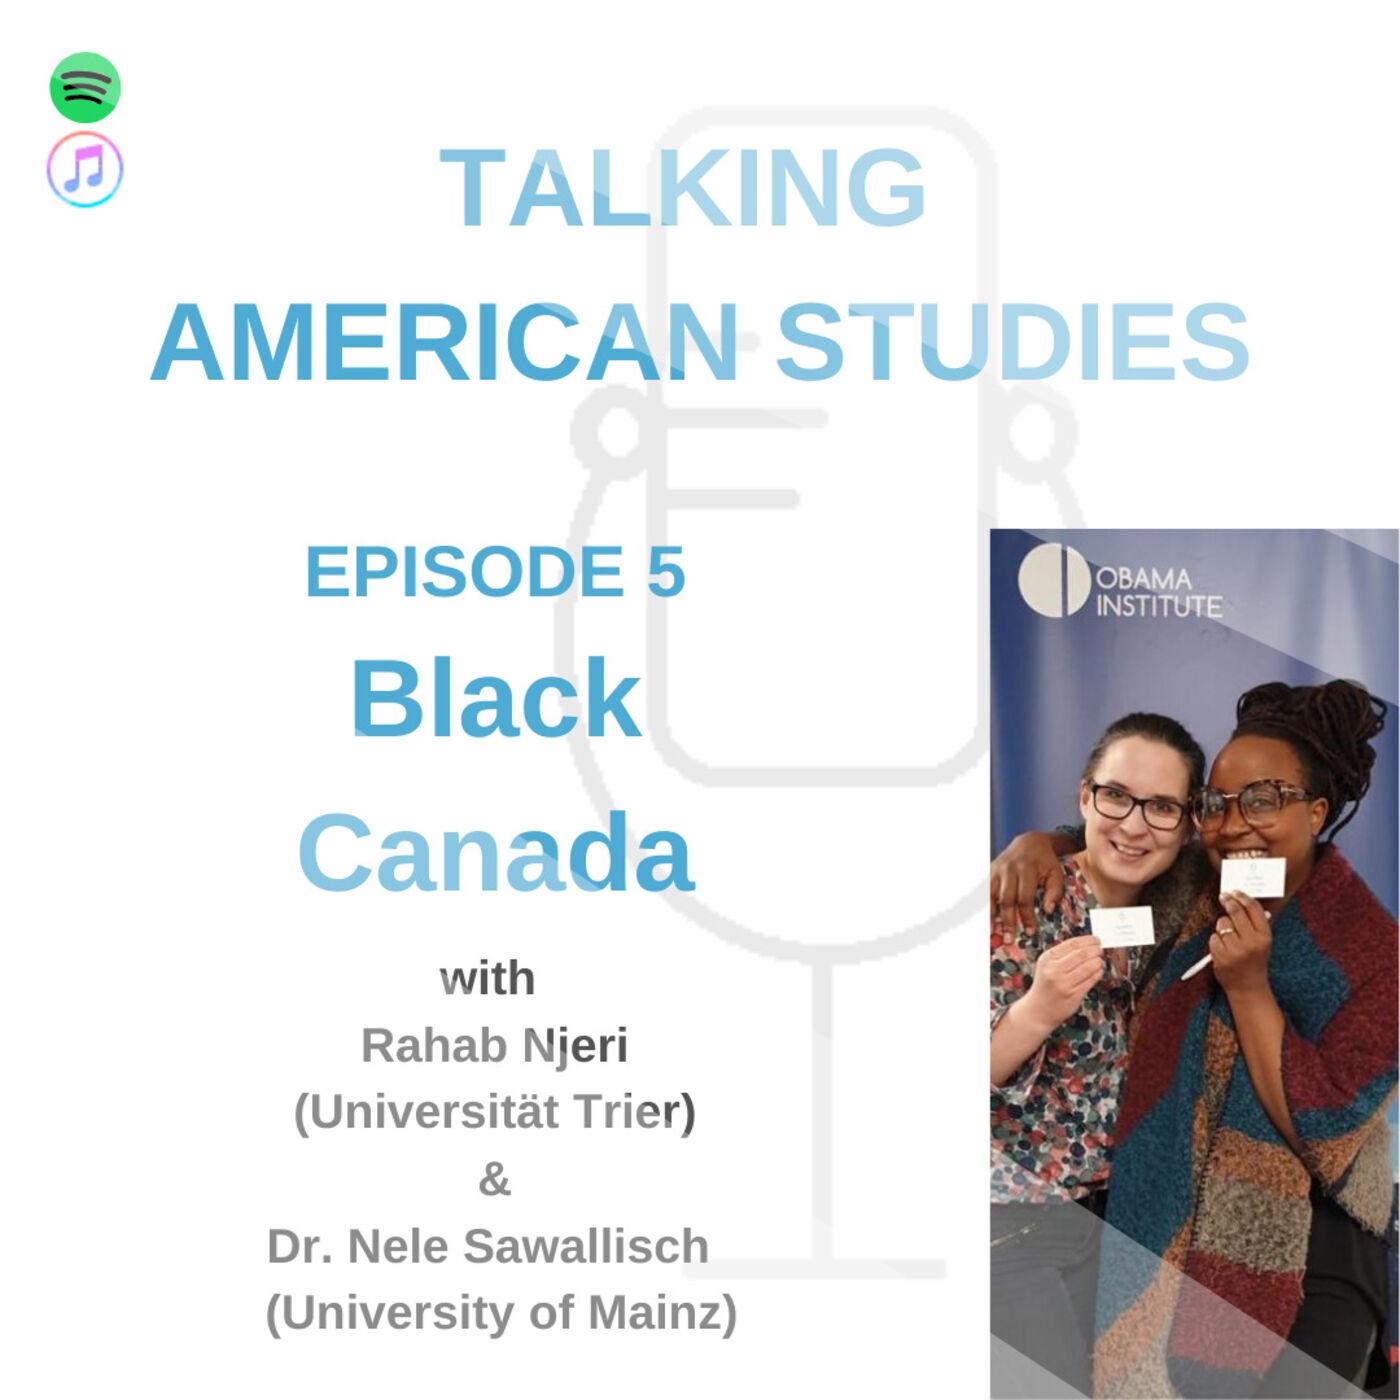 Black Canada with N. Sawallisch and R. Njeri